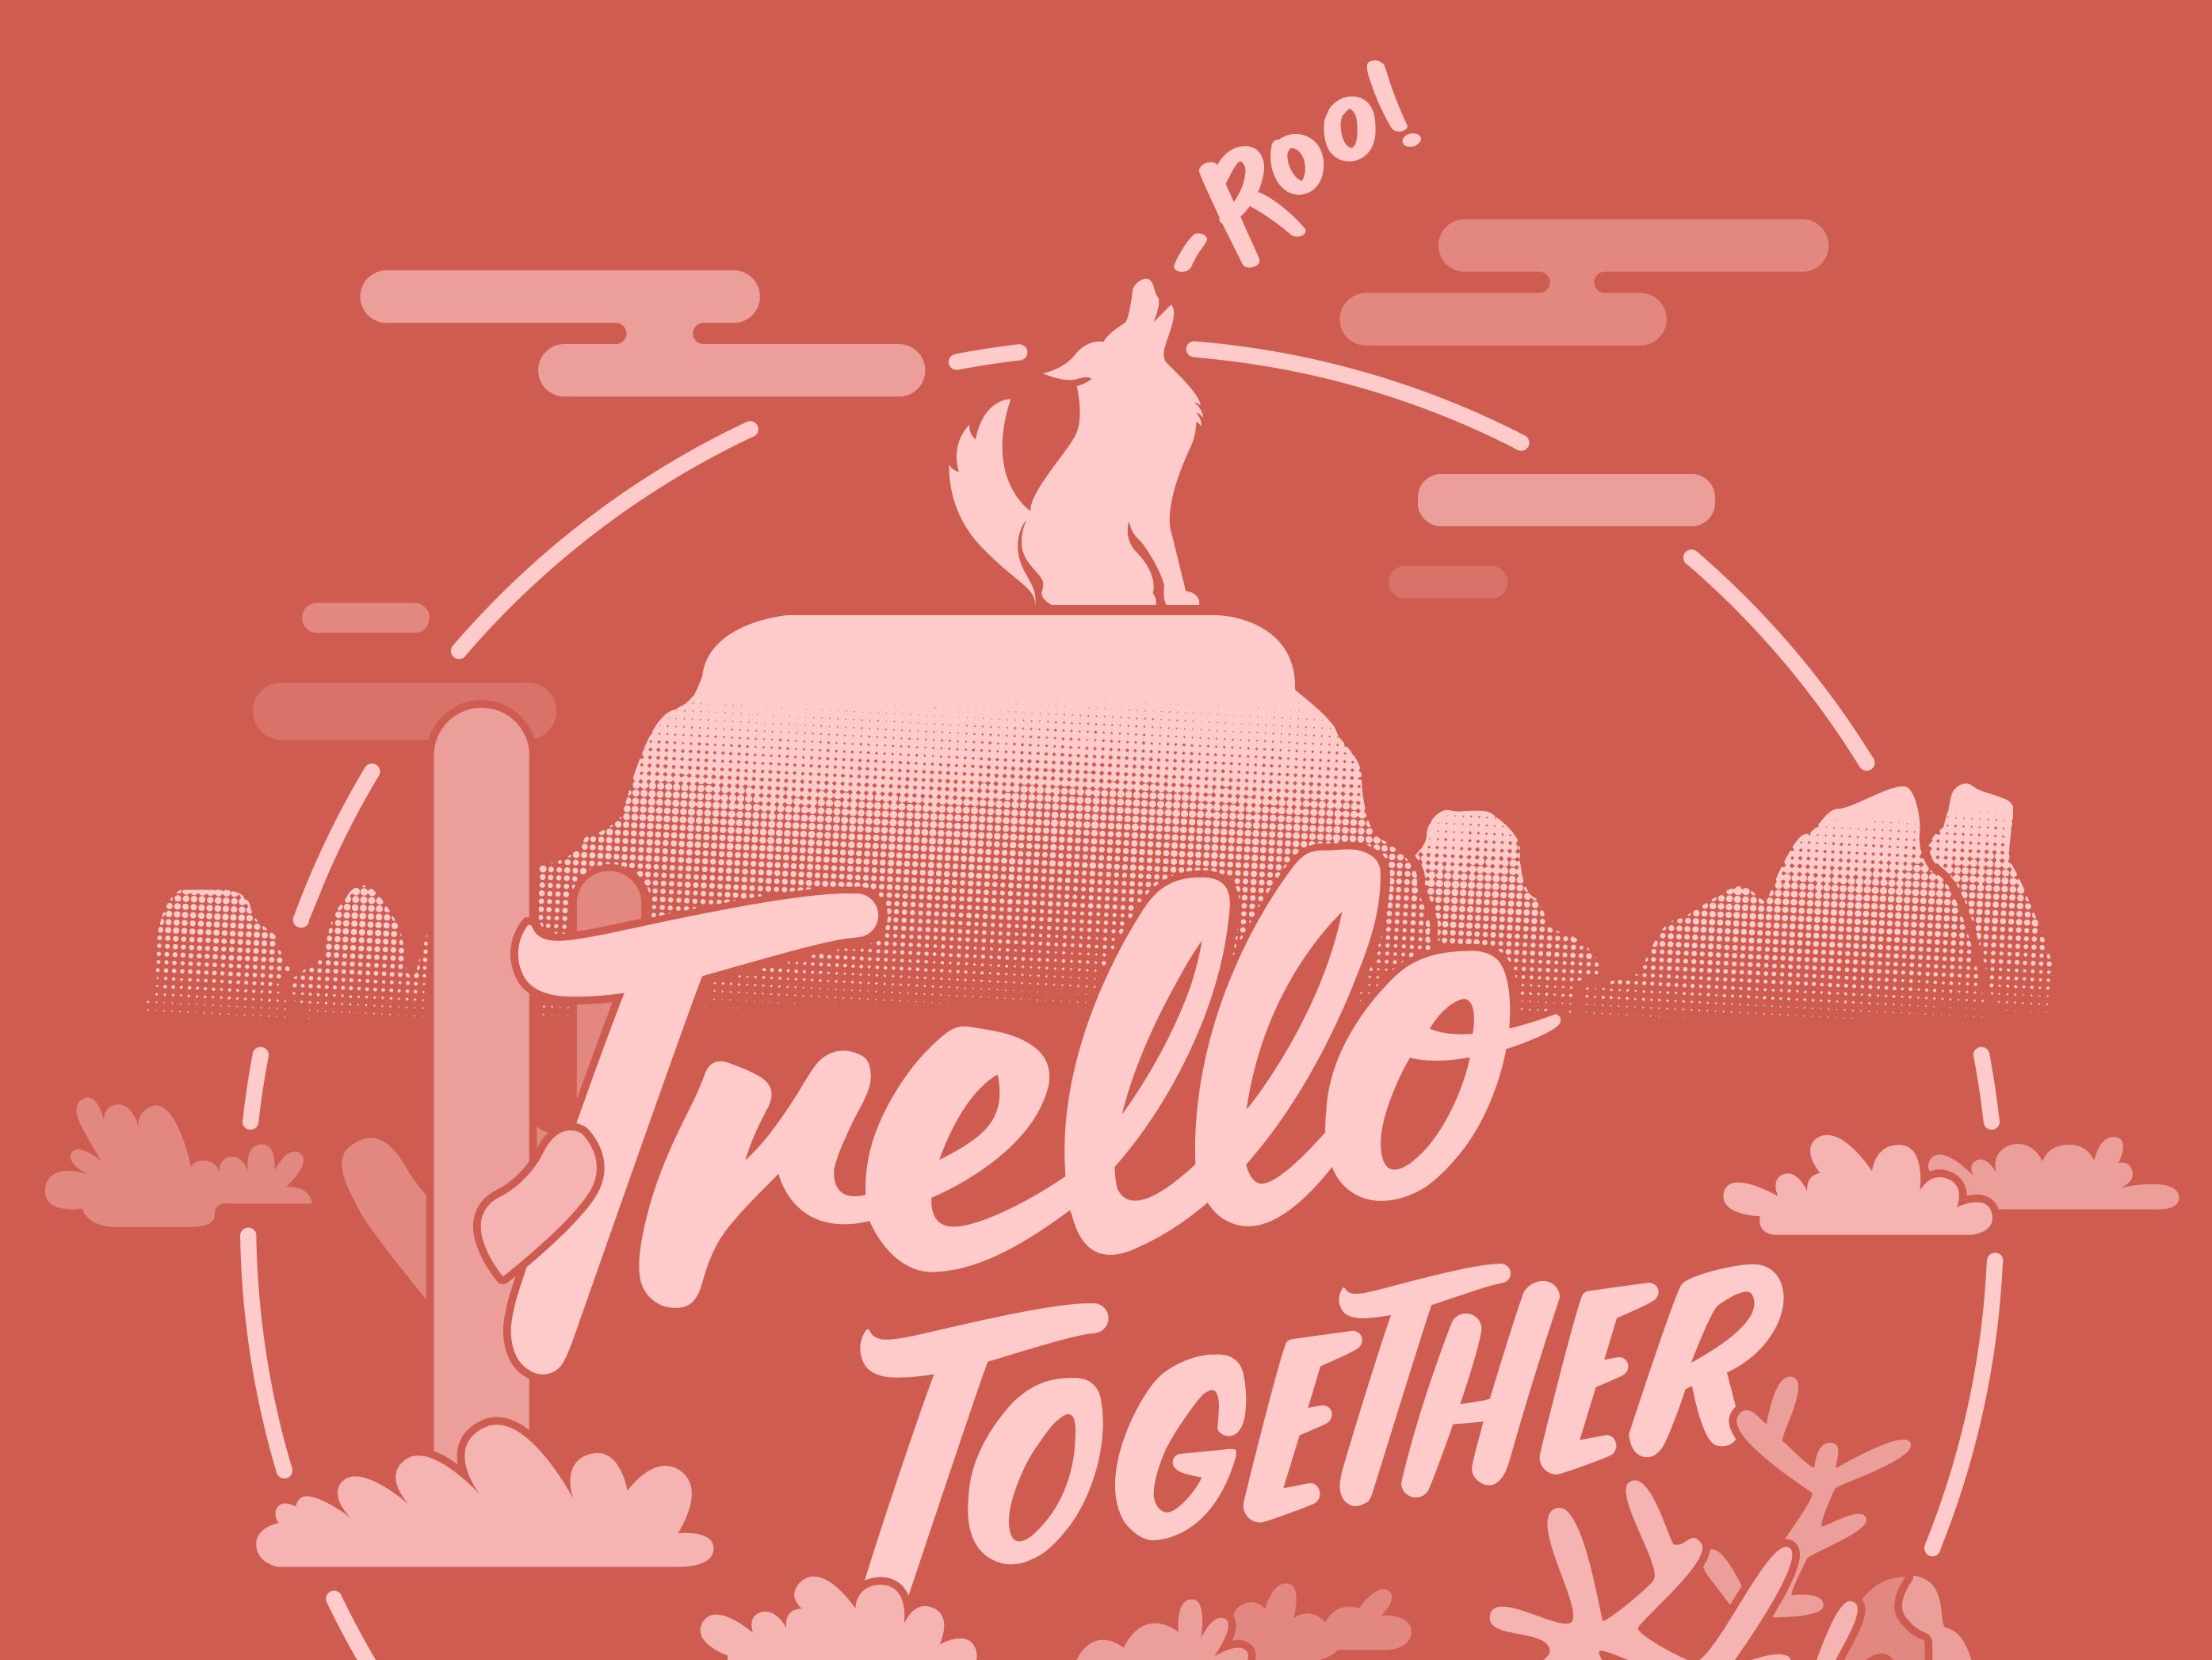 Trello together clean